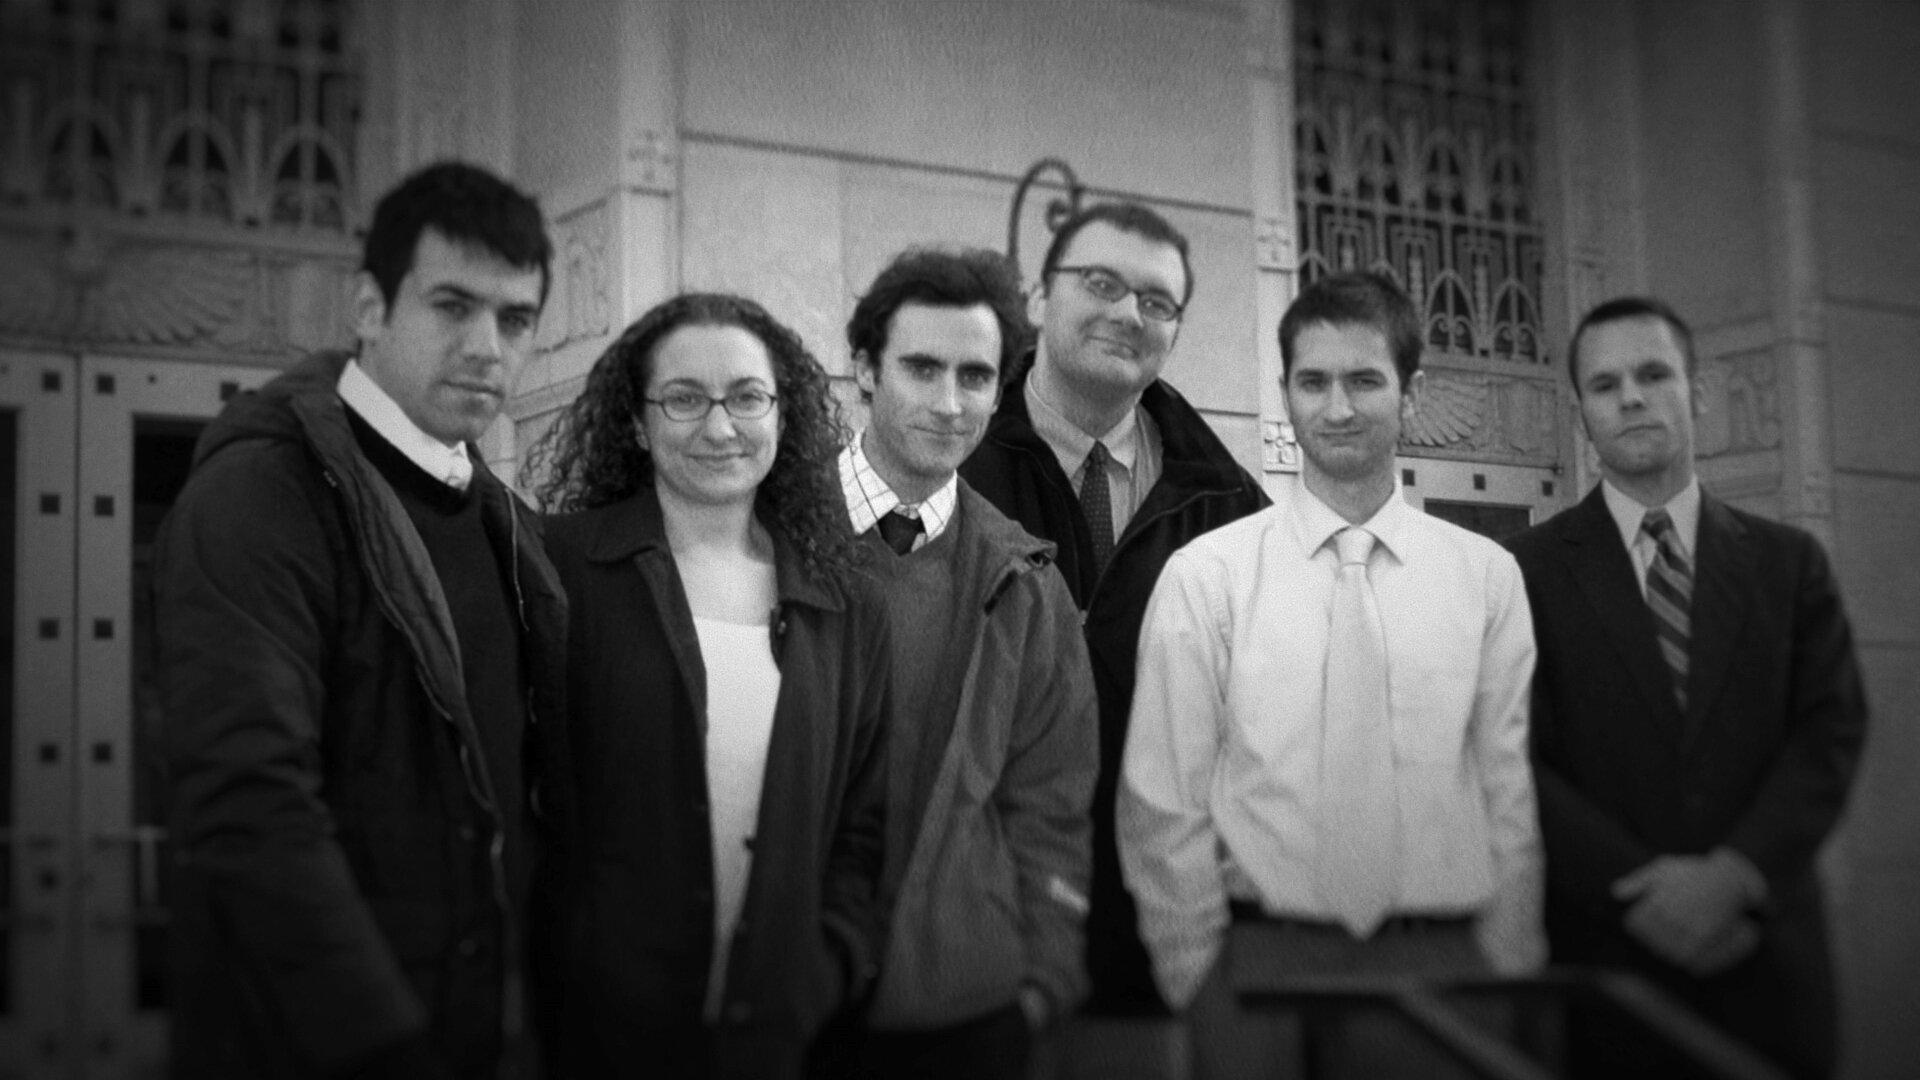 Courthouse Crew0.jpg